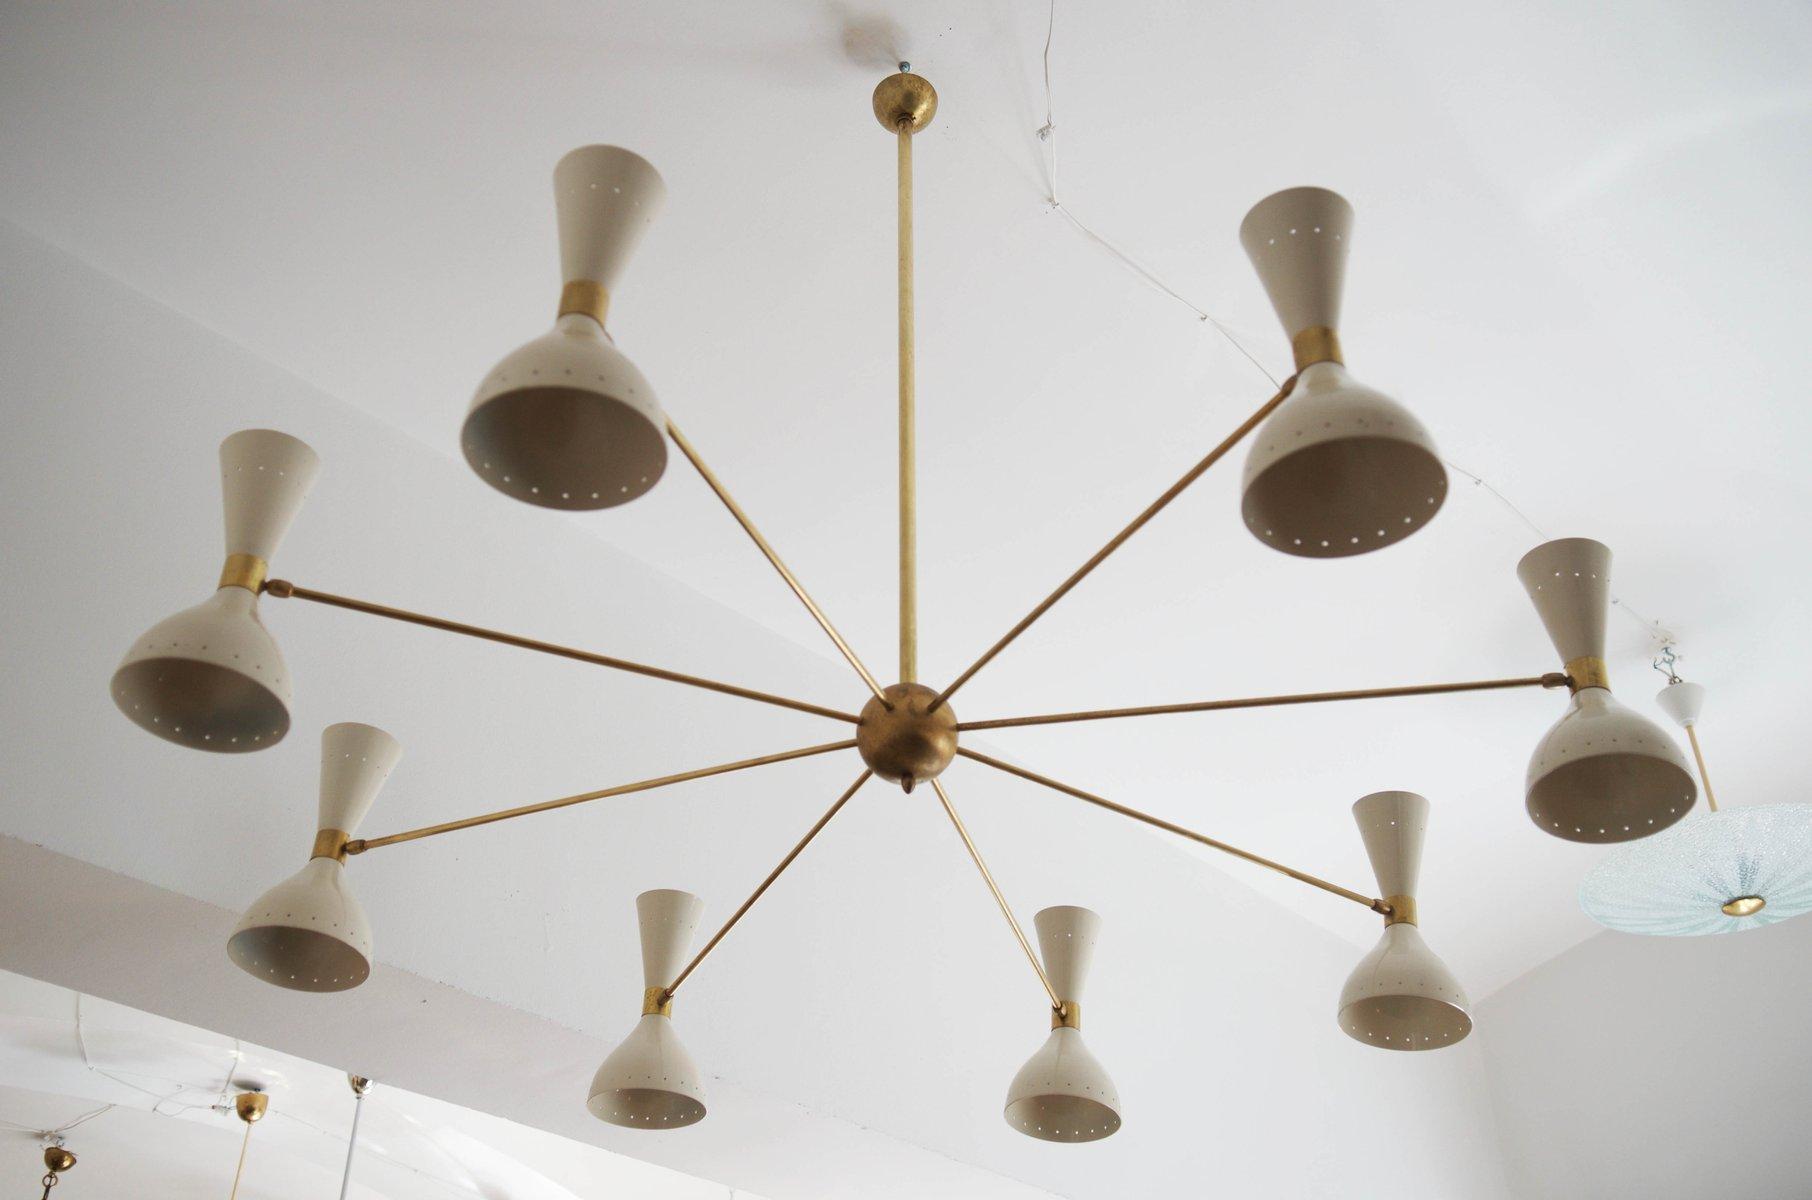 gro er mid century messing kronleuchter 1950er bei pamono kaufen. Black Bedroom Furniture Sets. Home Design Ideas